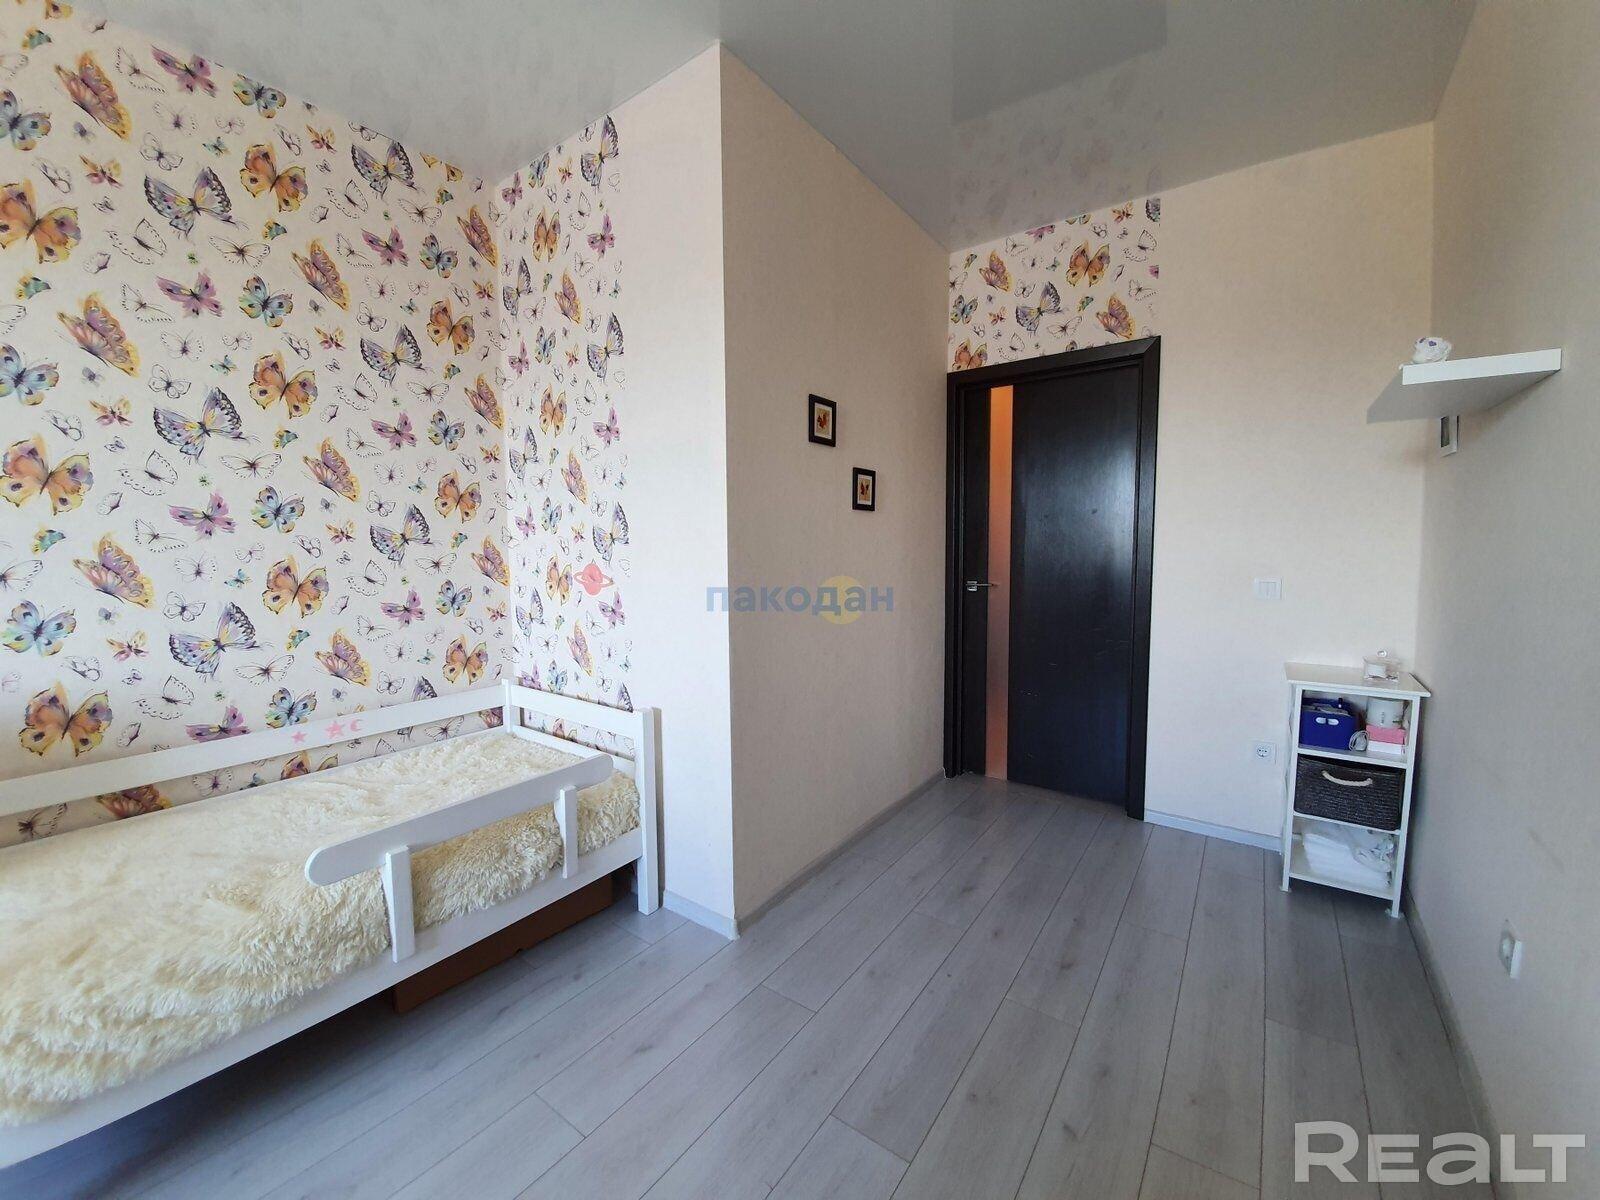 Продается 2-х комнатная квартира, Копище - фото №16